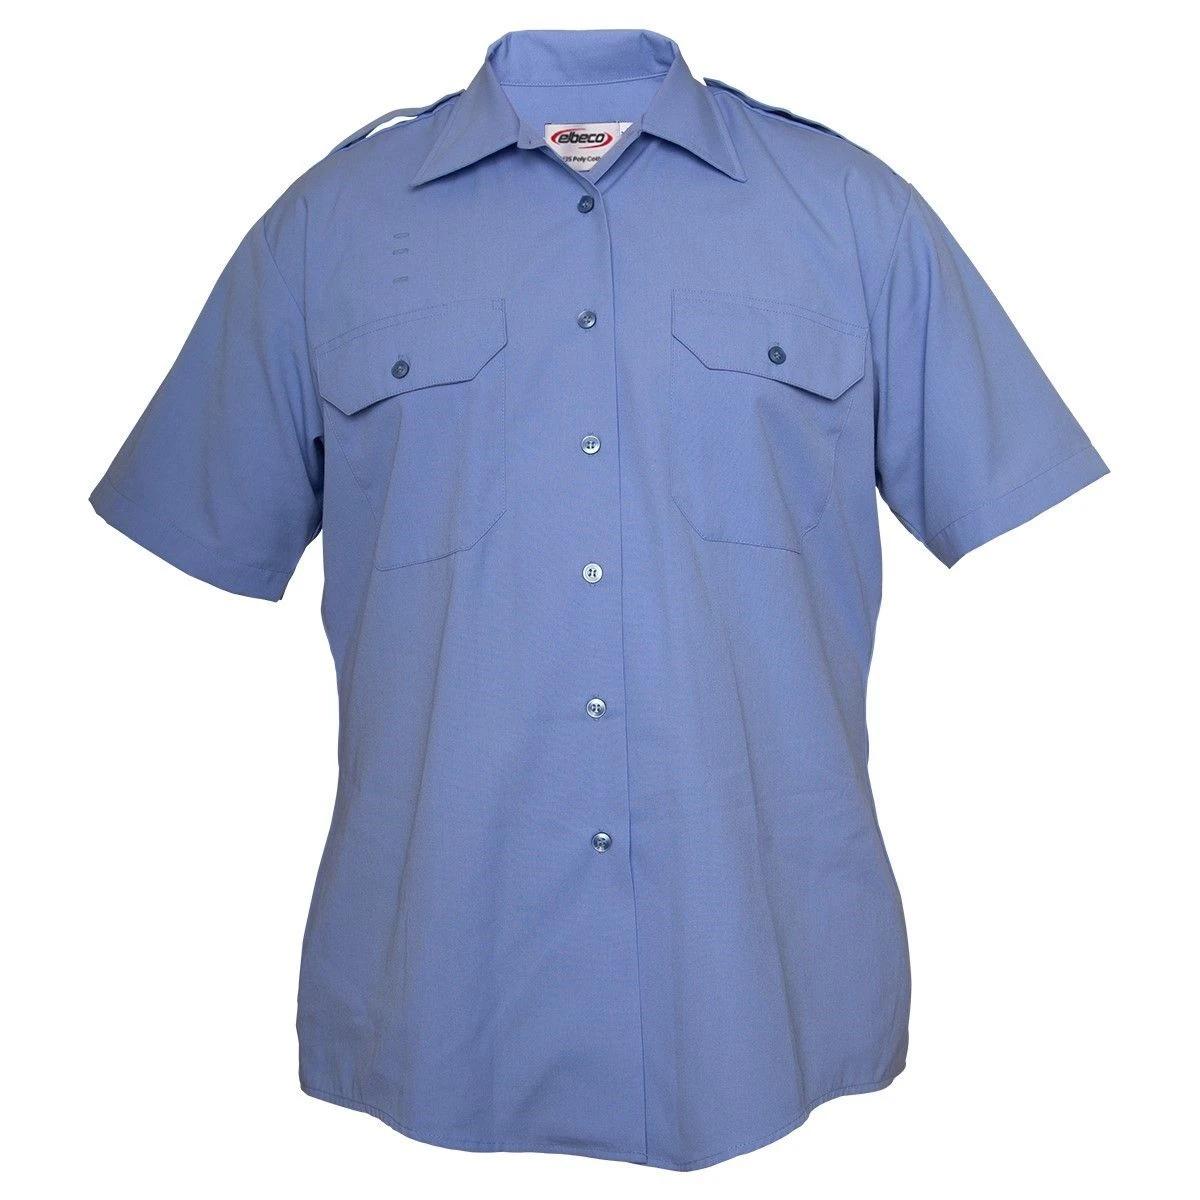 Elbeco Women's First Responder Shirt